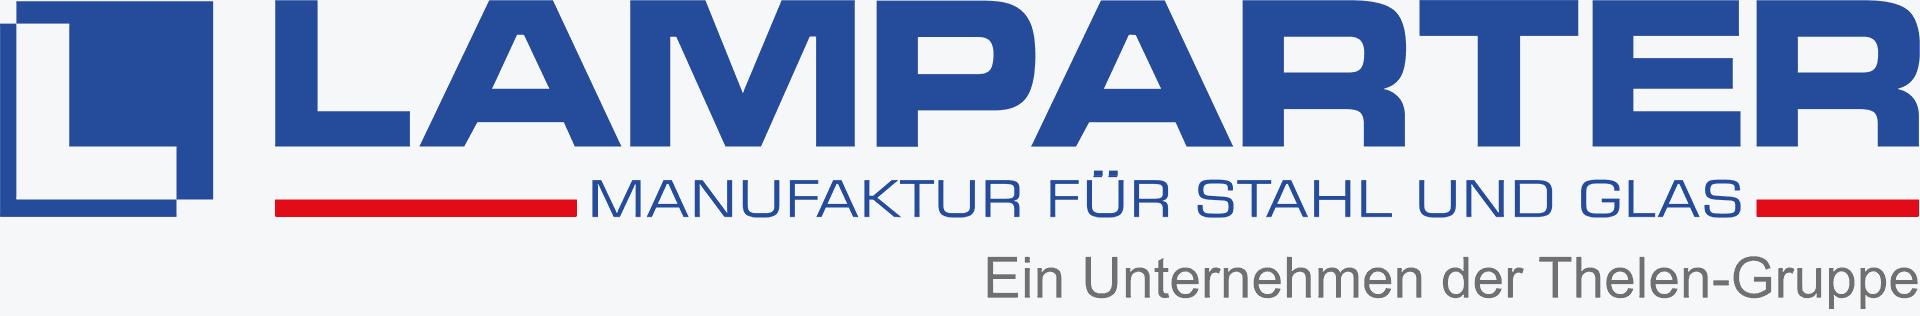 Lamparter Logo FullHD RGB transparent